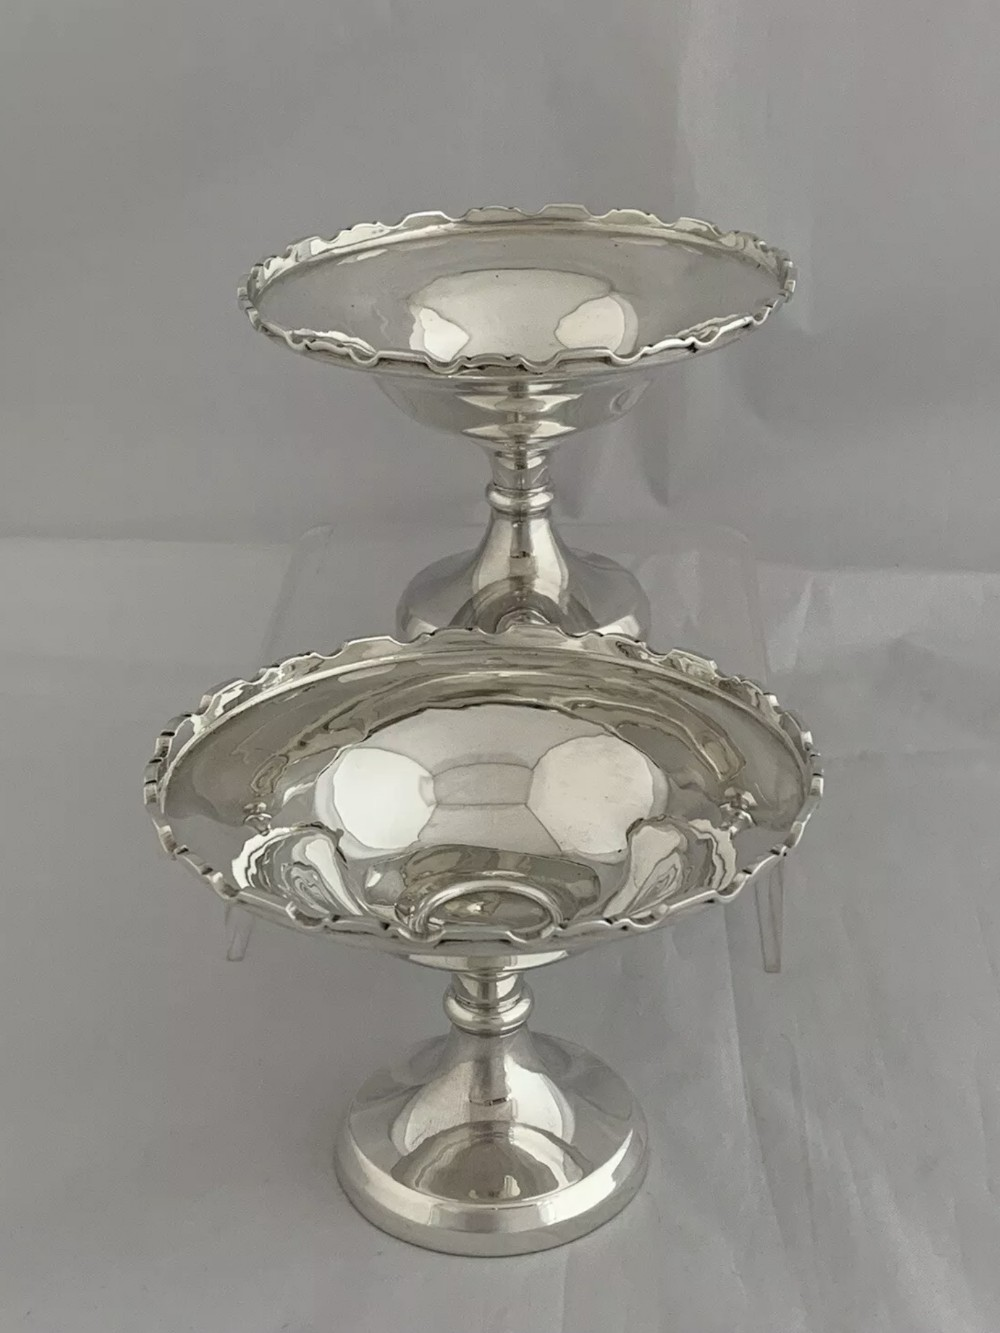 small pair of antique silver bowls or comports 1937 birmingham mason jones